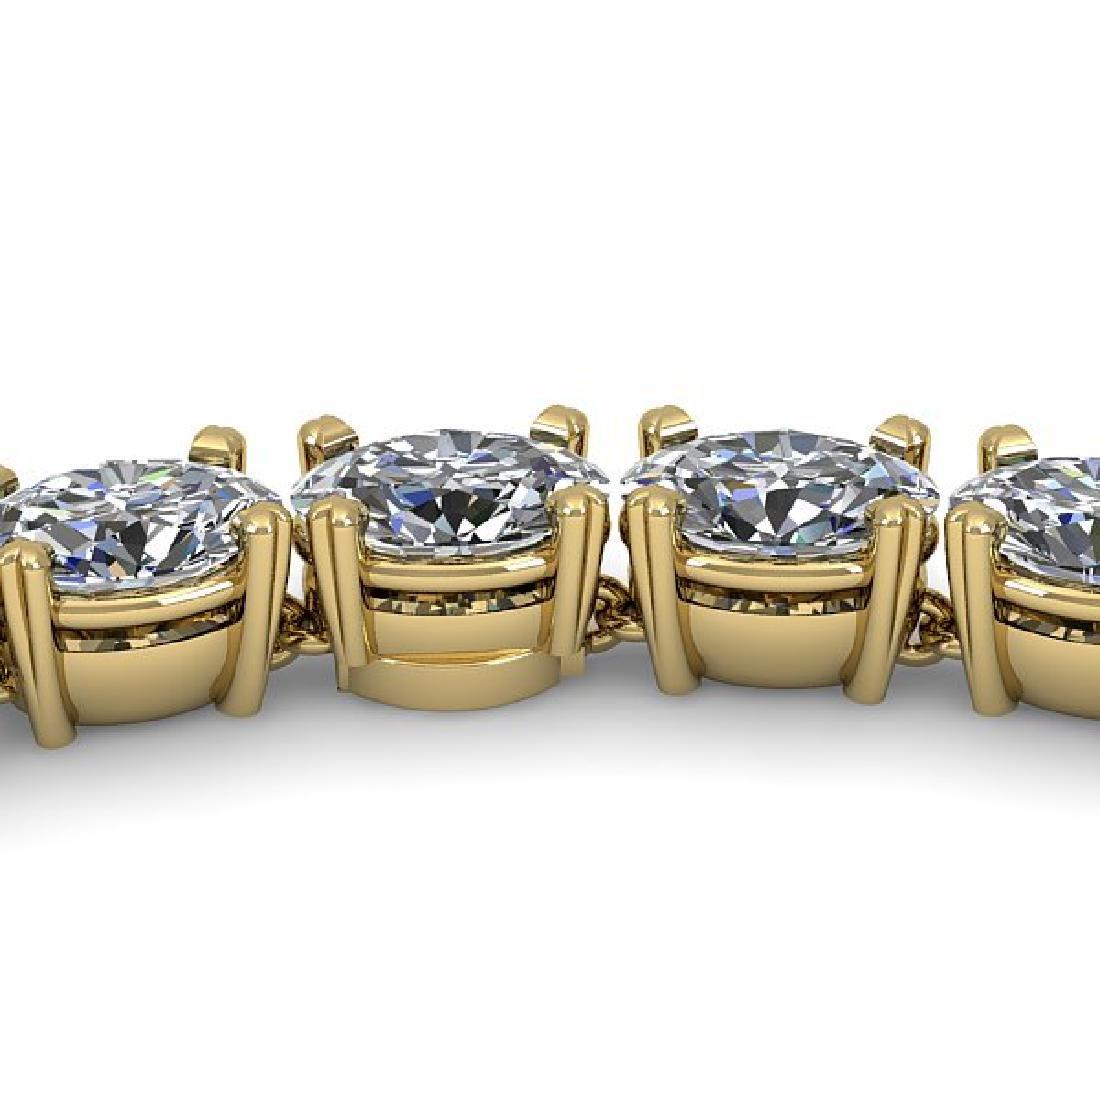 26 CTW Oval Cut Certified SI Diamond Necklace 14K